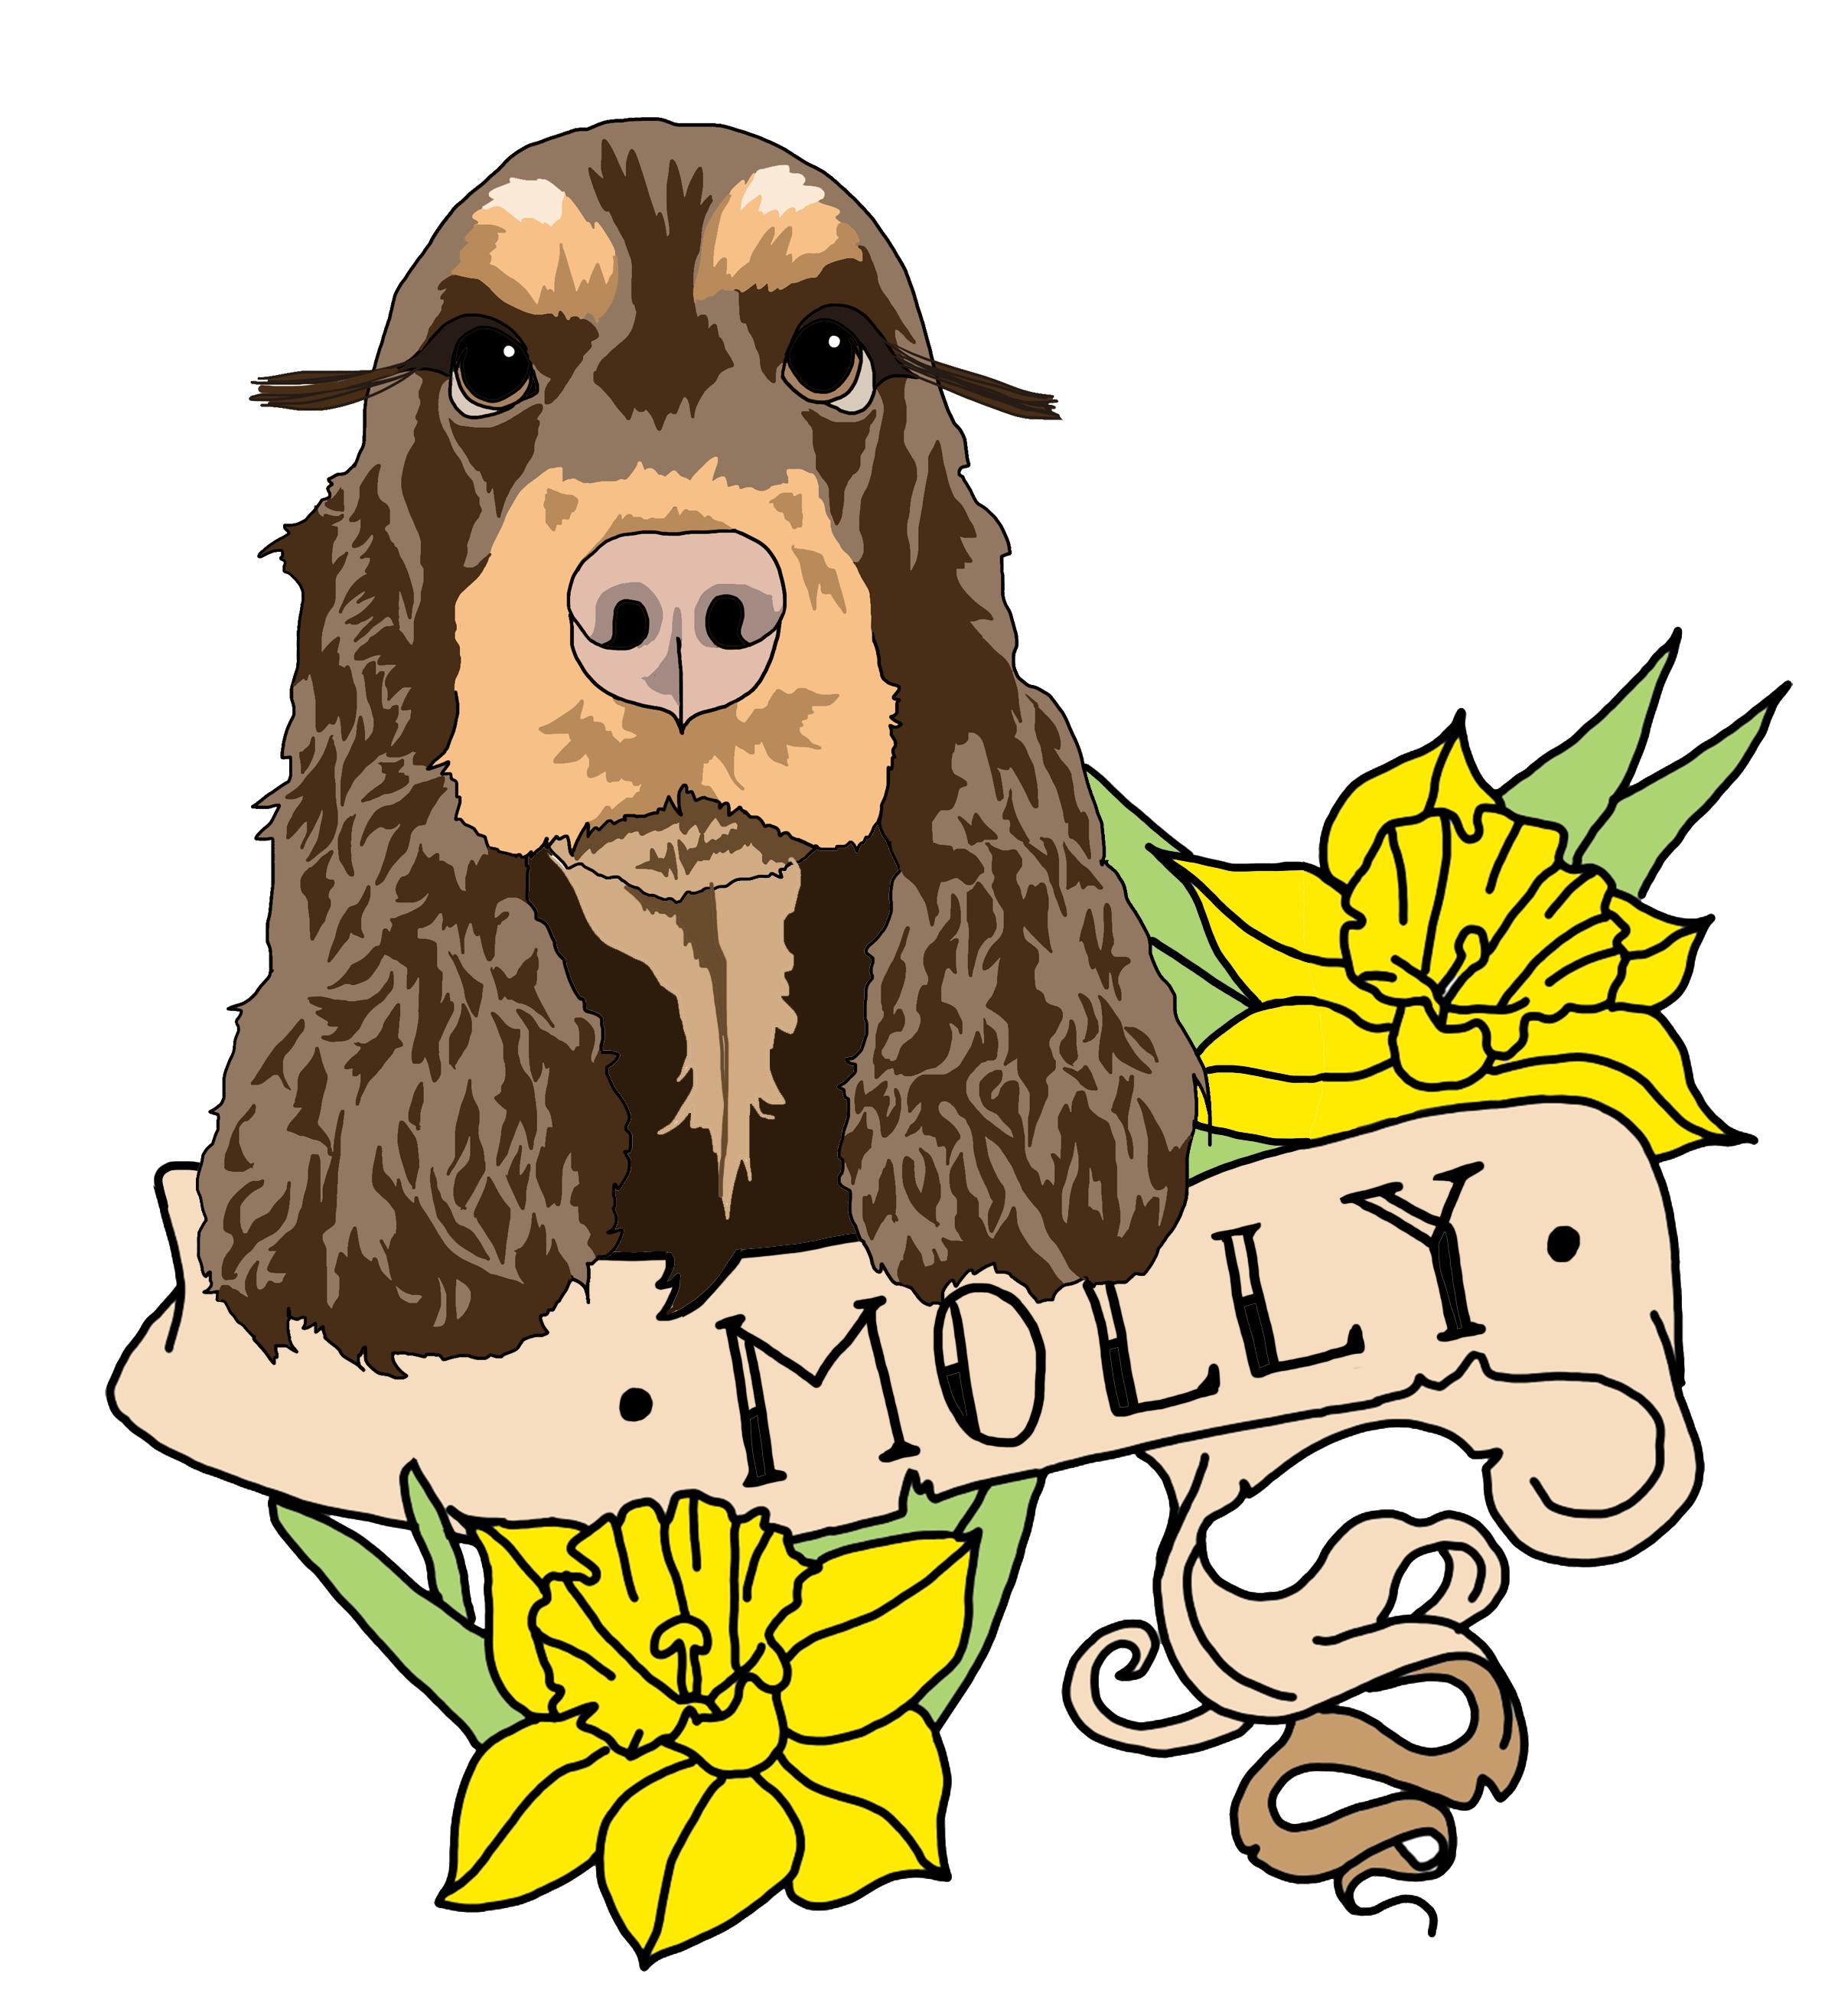 https://0201.nccdn.net/4_2/000/000/03f/ac7/molly-scroll.png